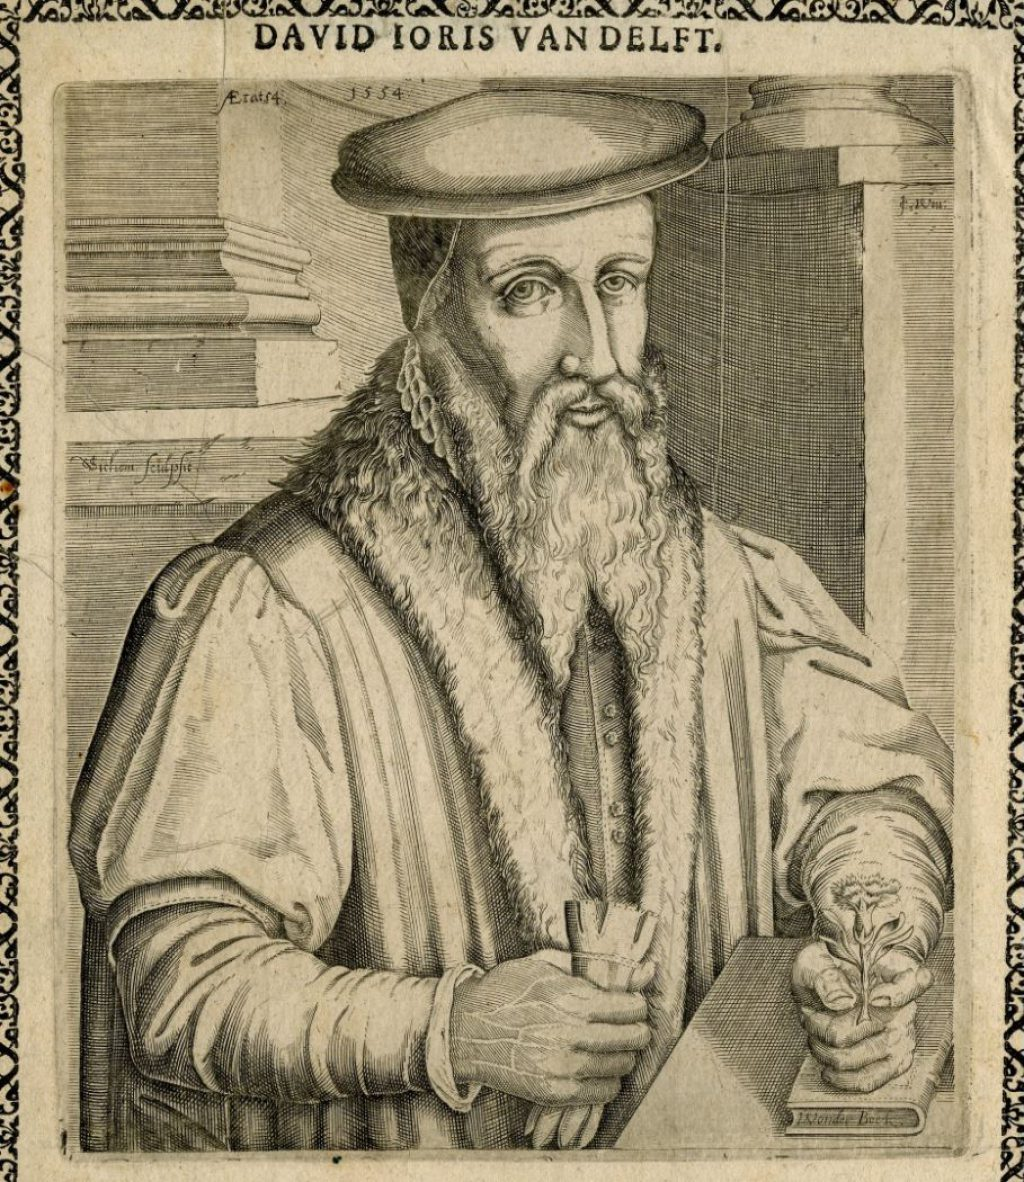 Portret van David Joris uit 1554. (TMS 59834)